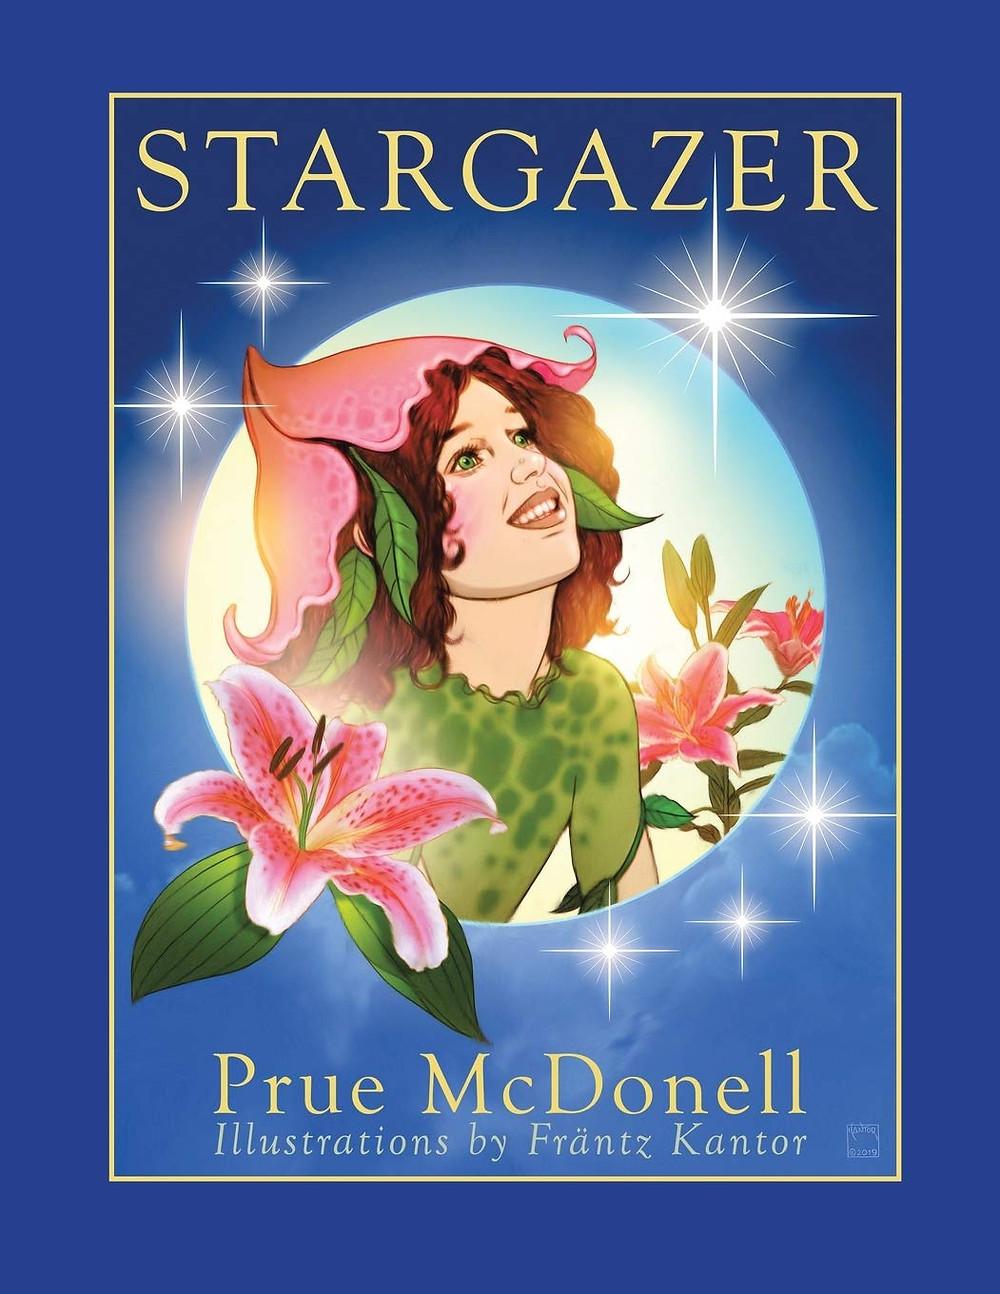 Book Talk: Stargazer by Prue McDonell